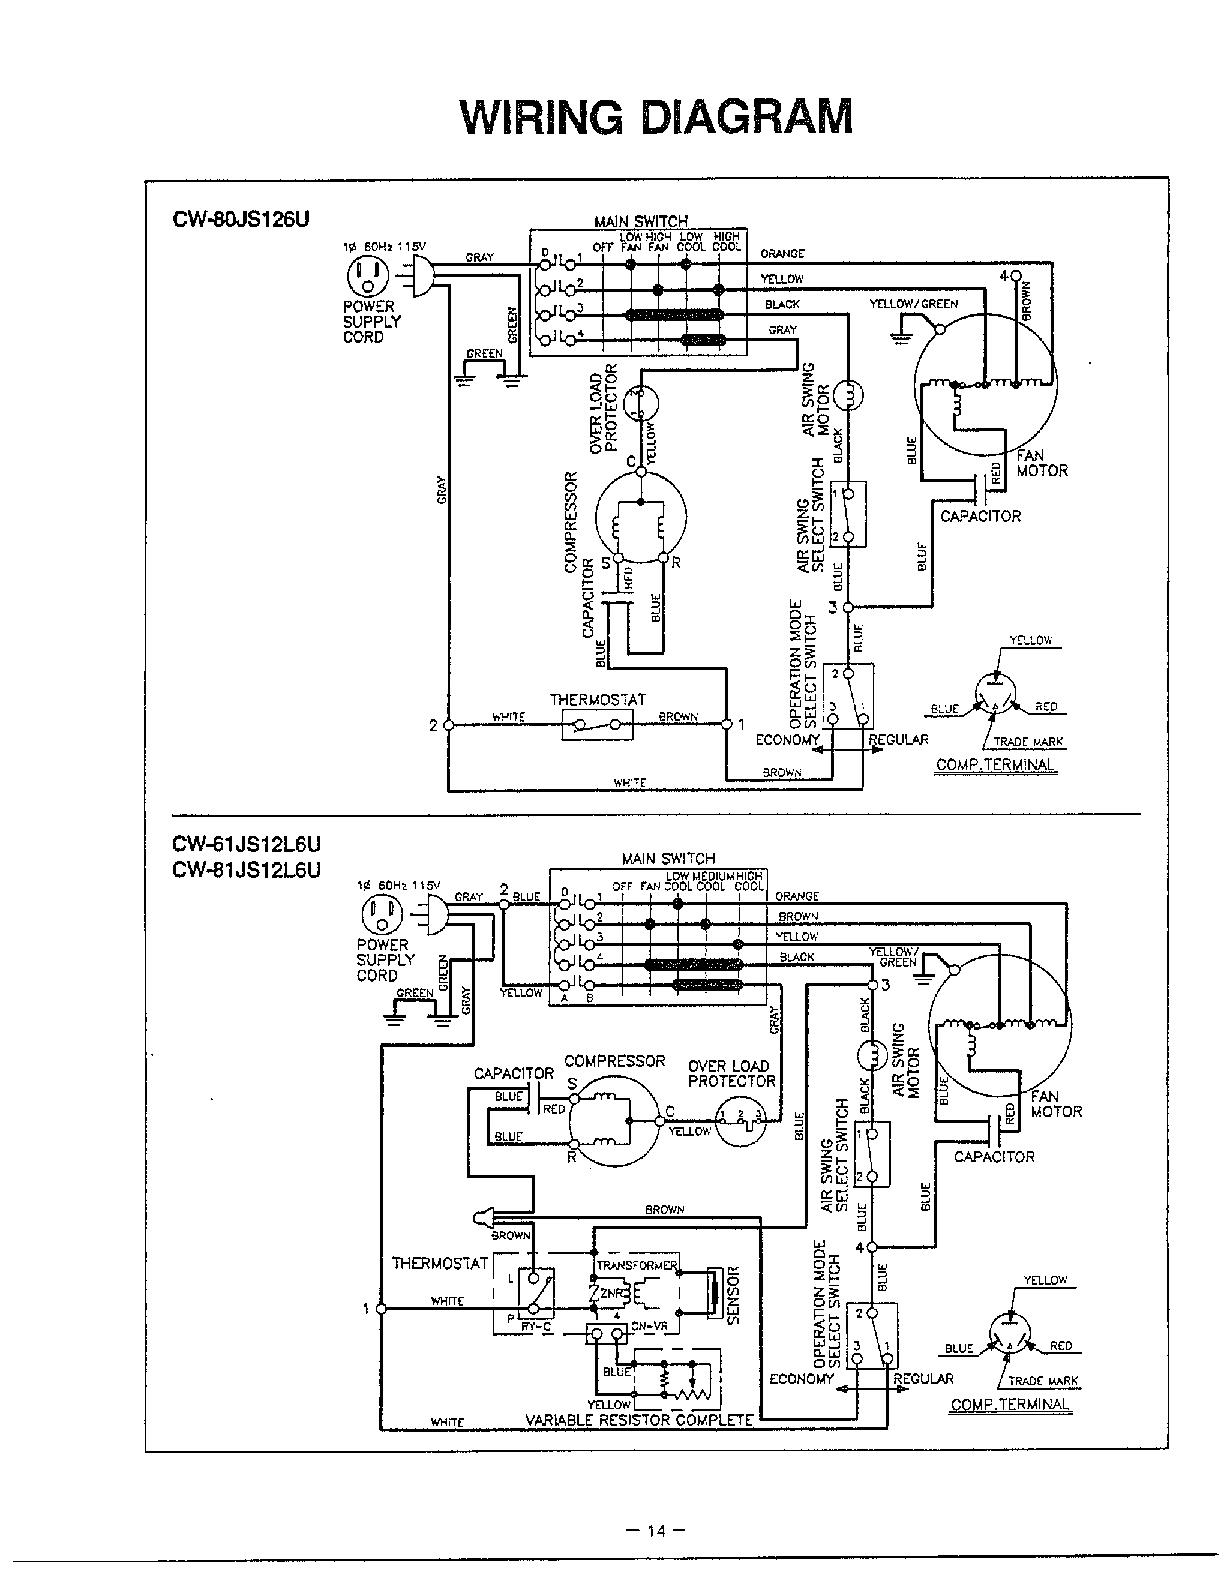 hight resolution of panasonic split type aircon wiring diagram wiring diagram rows carrier split system air conditioner wiring diagram koppel split type aircon wiring diagram